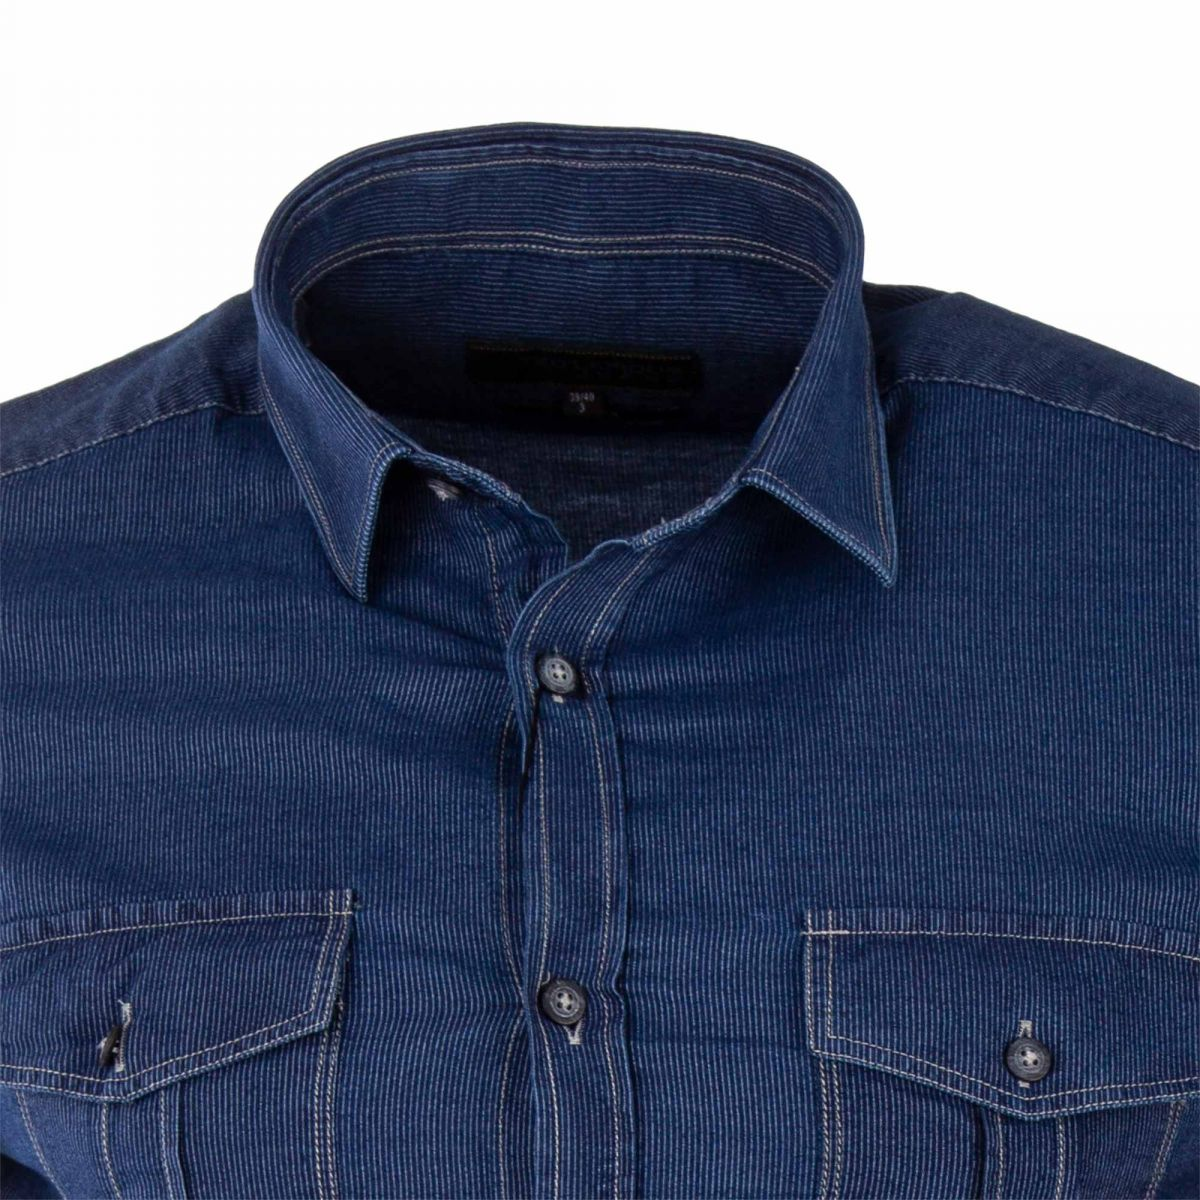 chemise en jean homme ted lapidus prix d griff. Black Bedroom Furniture Sets. Home Design Ideas